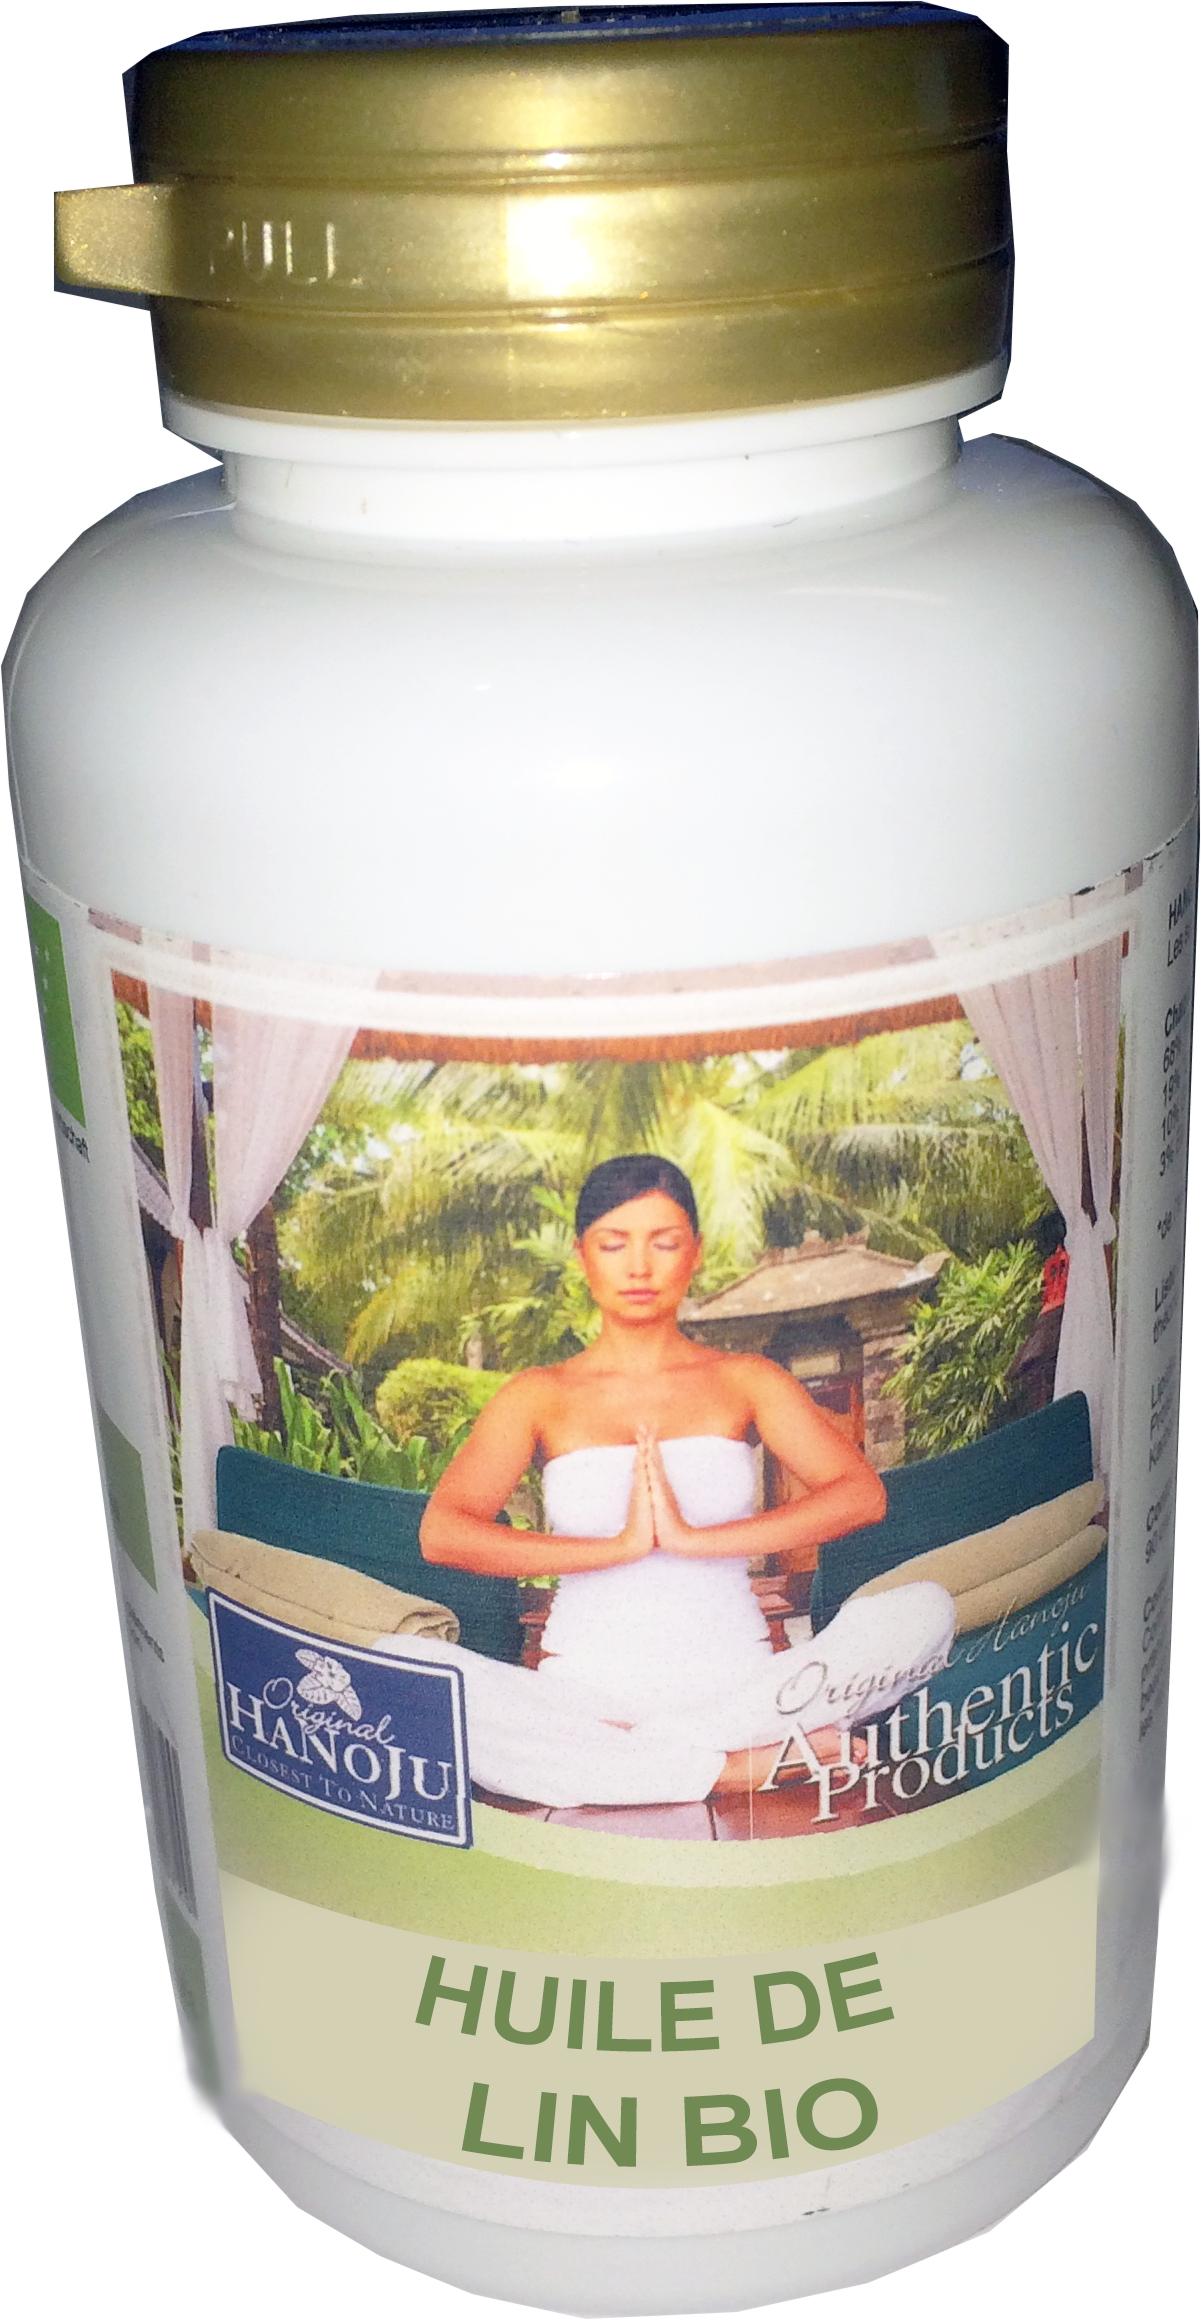 Hanoju Huile de Lin Bio - 120 gélules - 270 mg